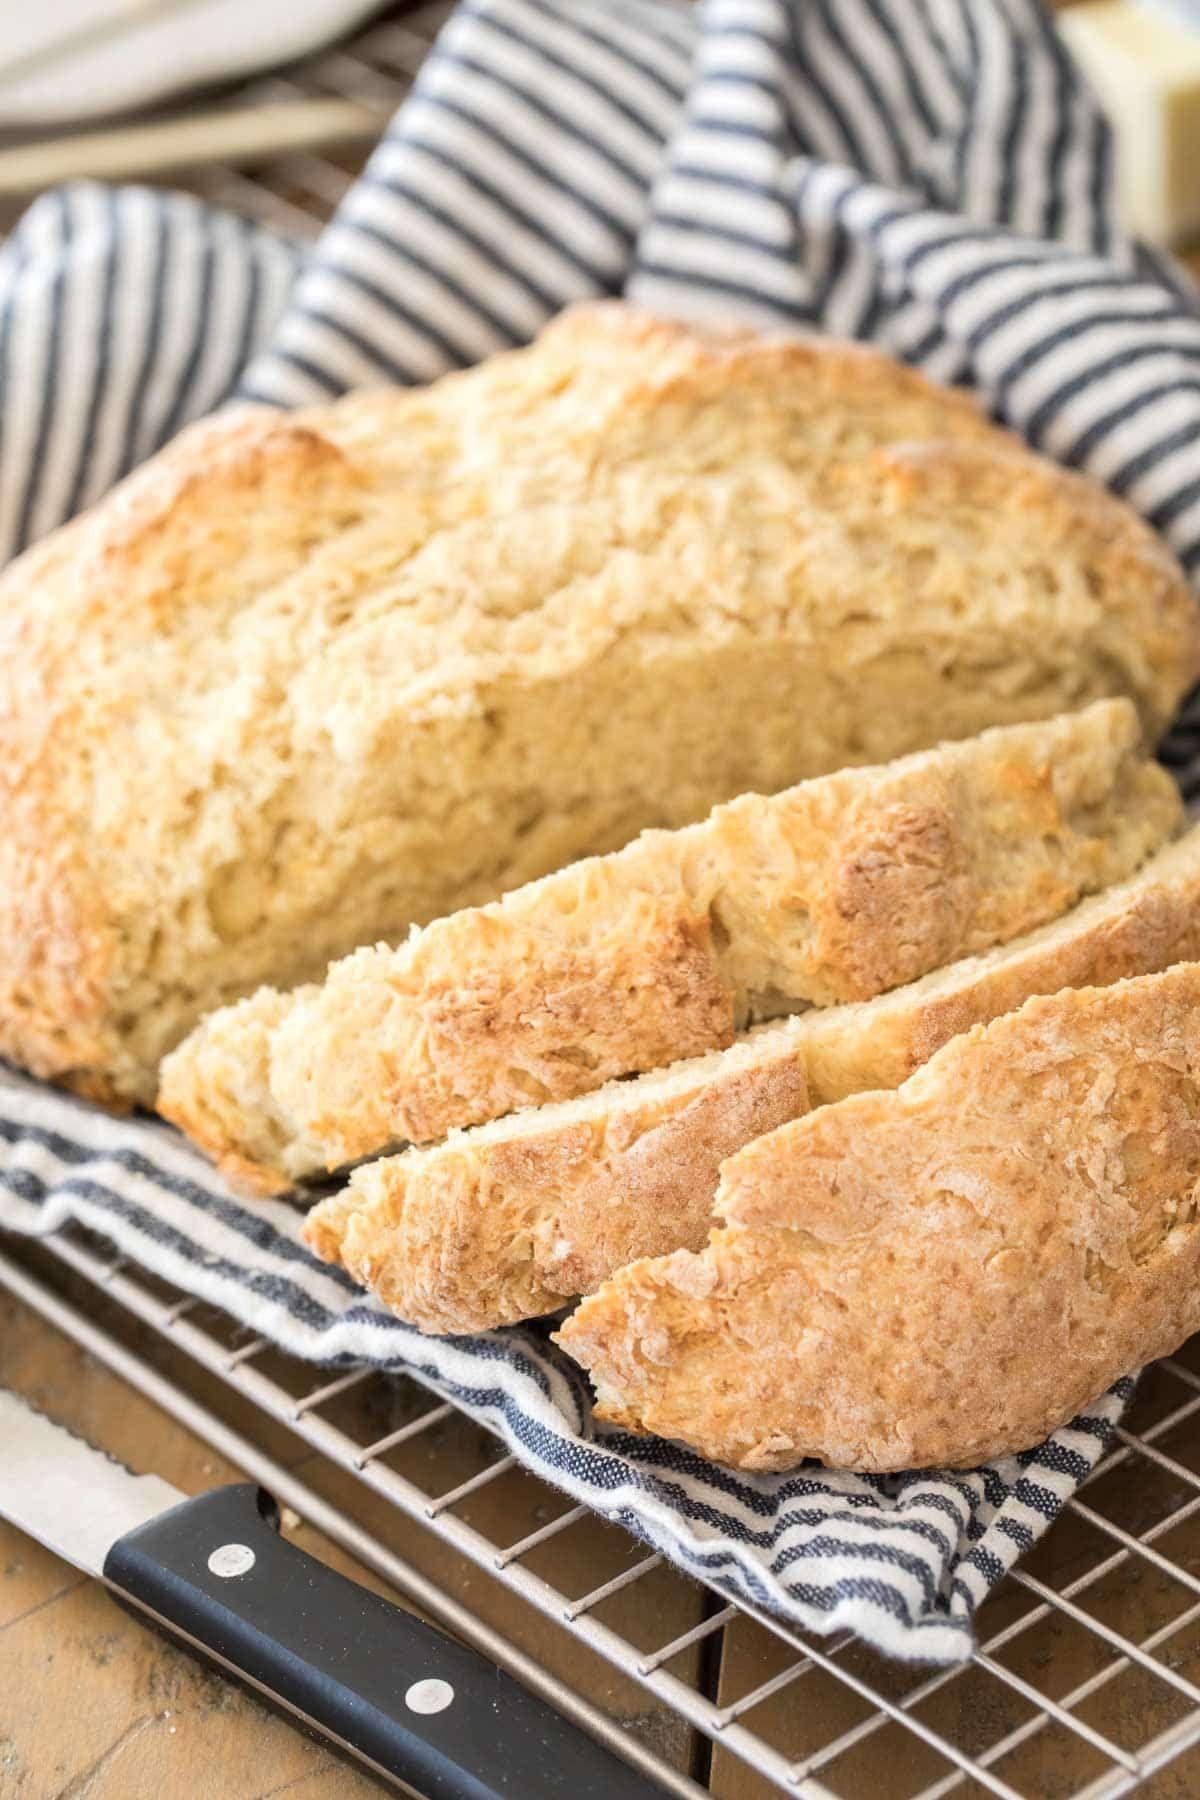 No Yeast Bread Soda Bread Sugar Spun Run In 2020 No Yeast Bread Dessert Recipes Easy Sugar Bread